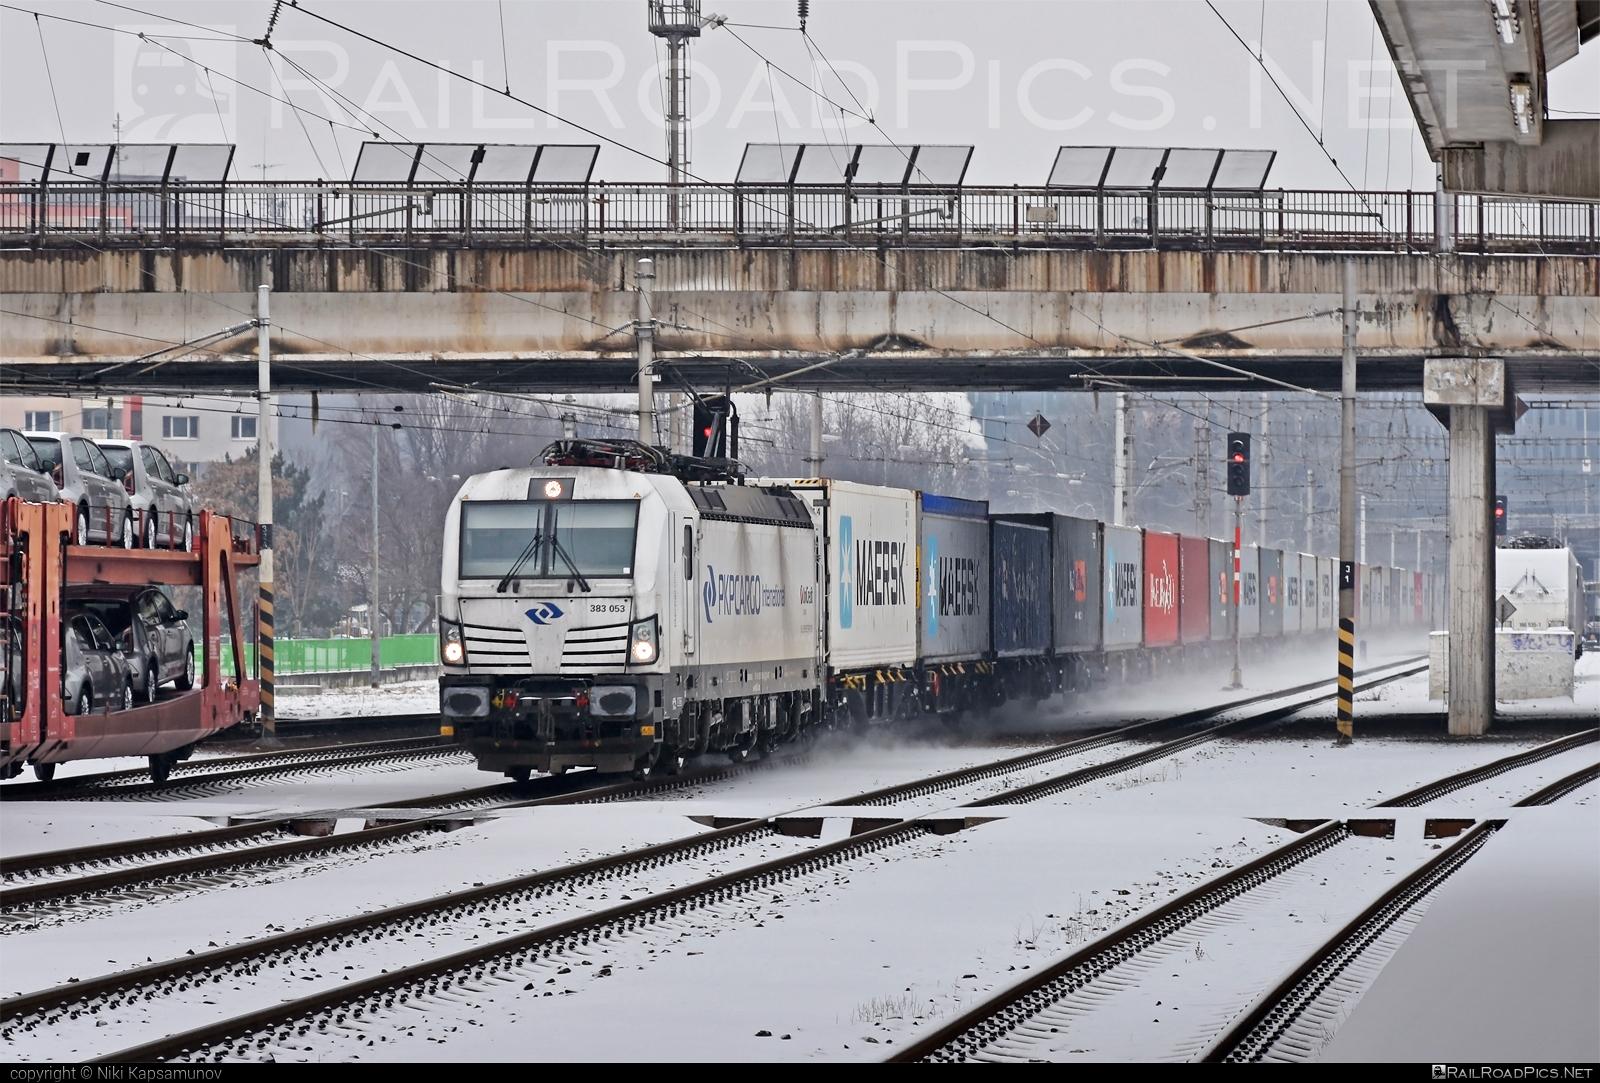 Siemens Vectron MS - 383 053 operated by PKP CARGO INTERNATIONAL a.s. #flatwagon #pkpcargointernational #pkpcargointernationalas #siemens #siemensvectron #siemensvectronms #vectron #vectronms